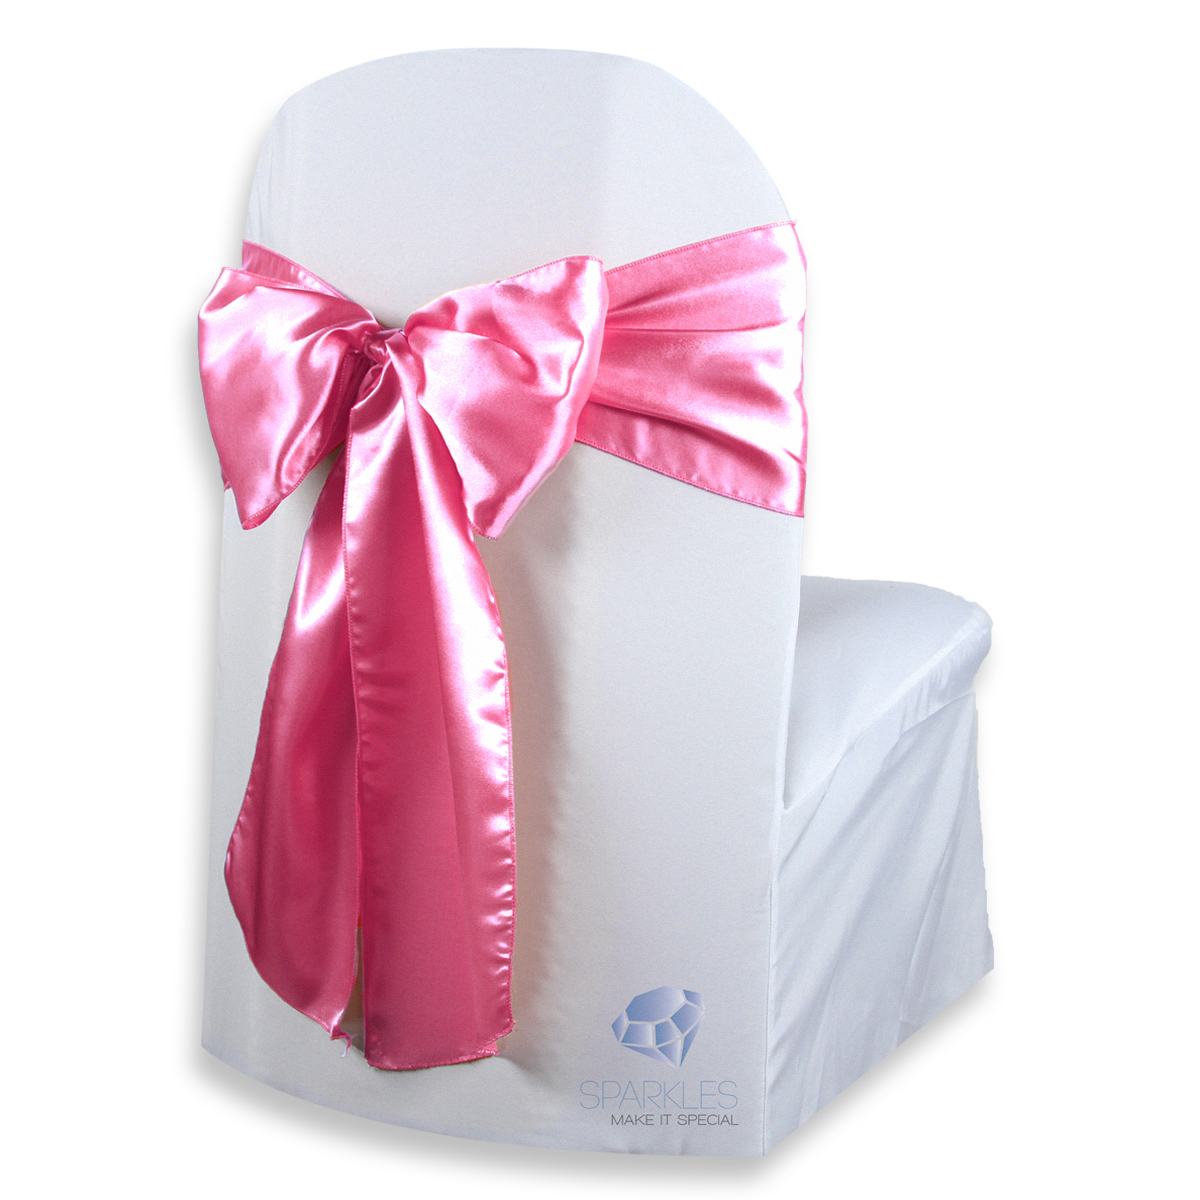 100 Pcs Satin Chair Cover Bow Sash 108x8 Wedding Party Banquet Reception